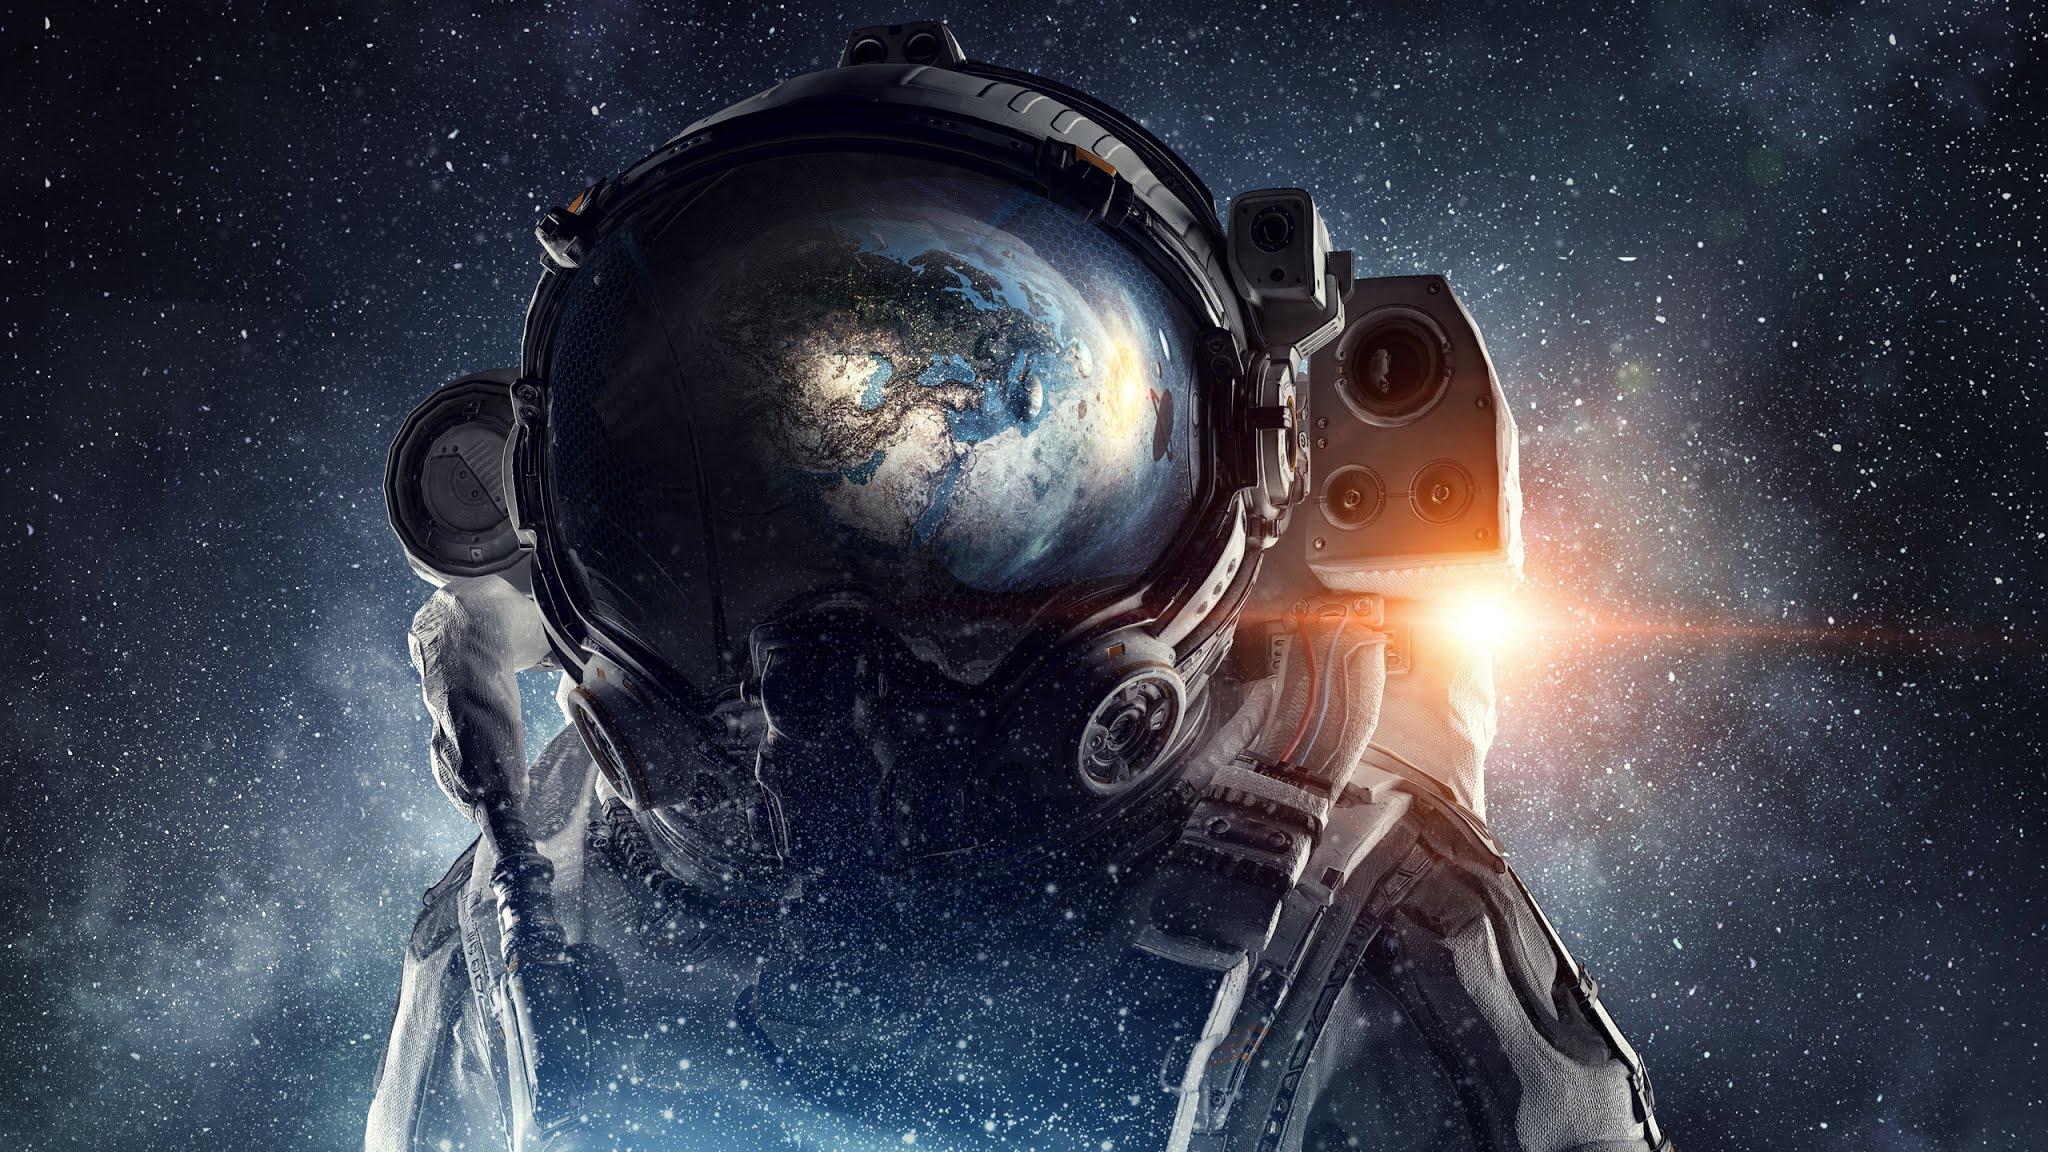 Wallpaper Astronaut Tumblr